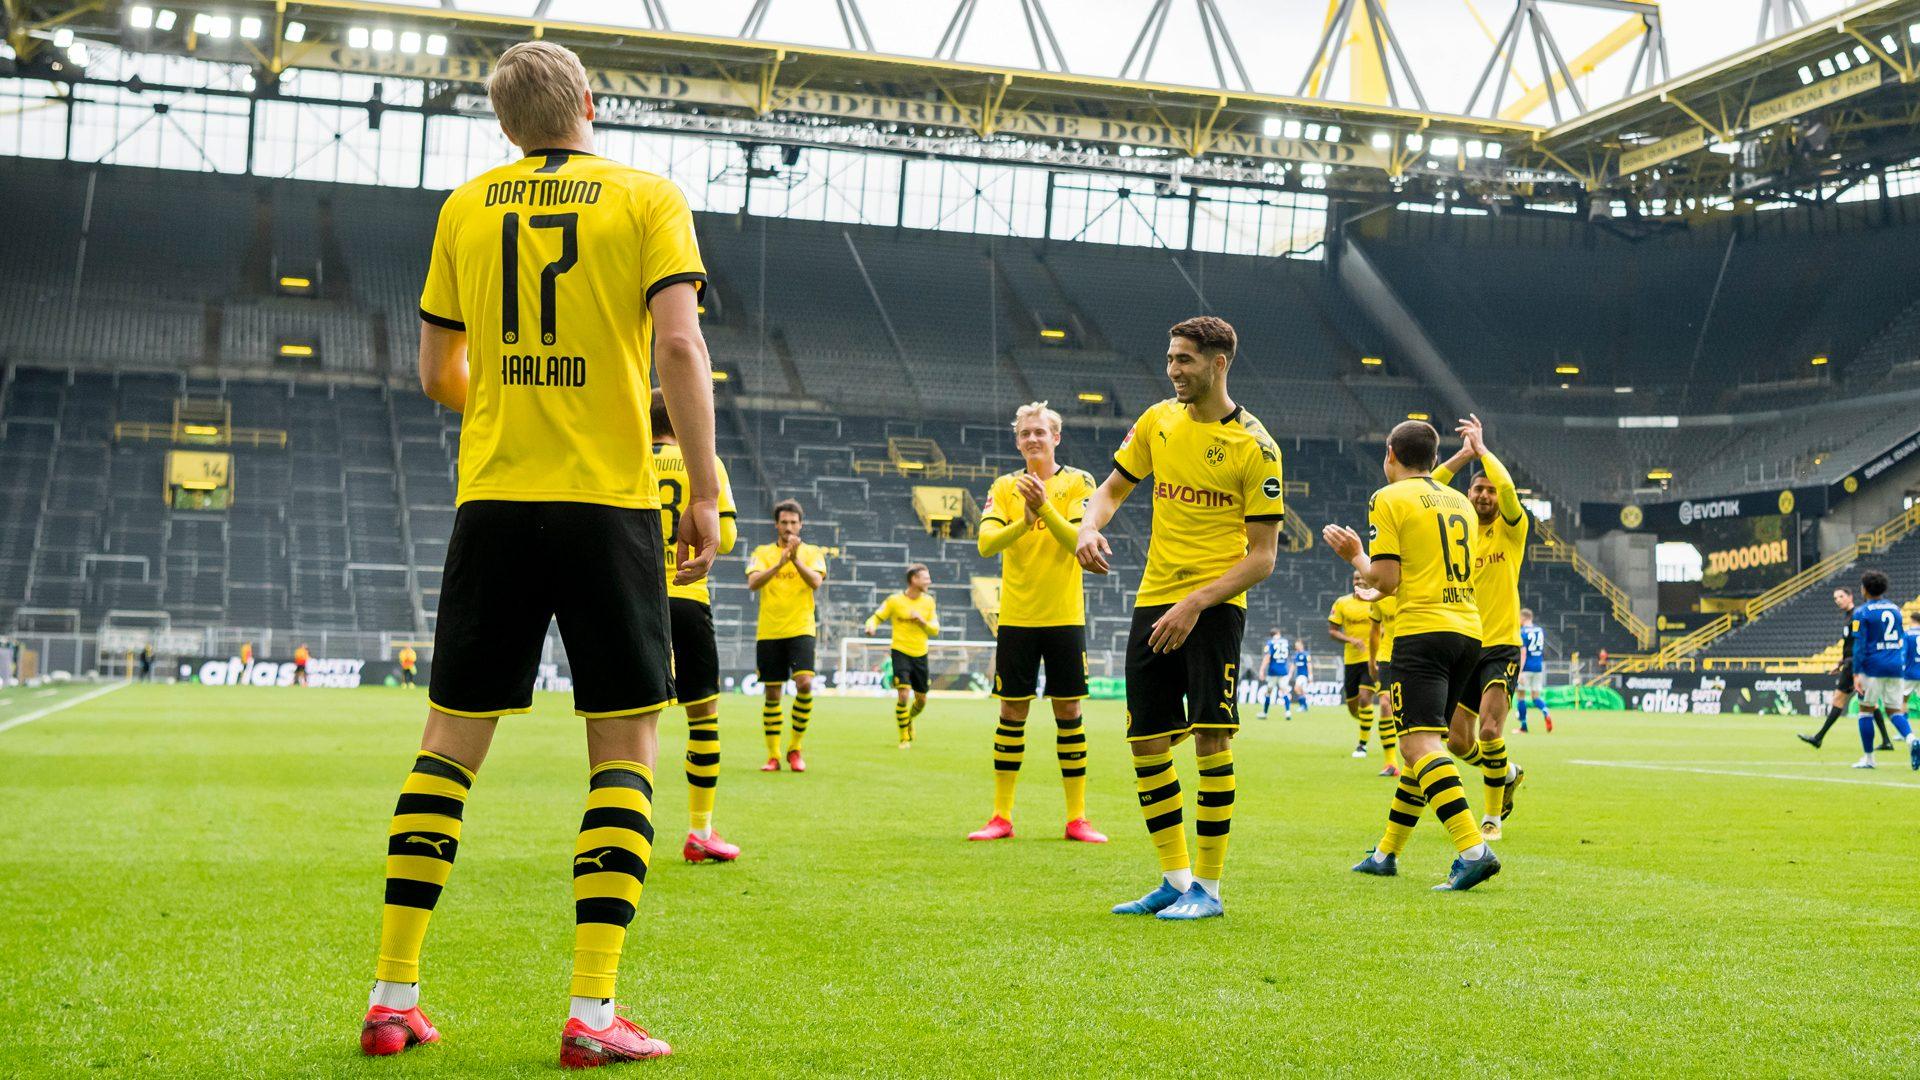 Bundesliga Do Borussia Dortmund Have The Best Squad In The Bundesliga